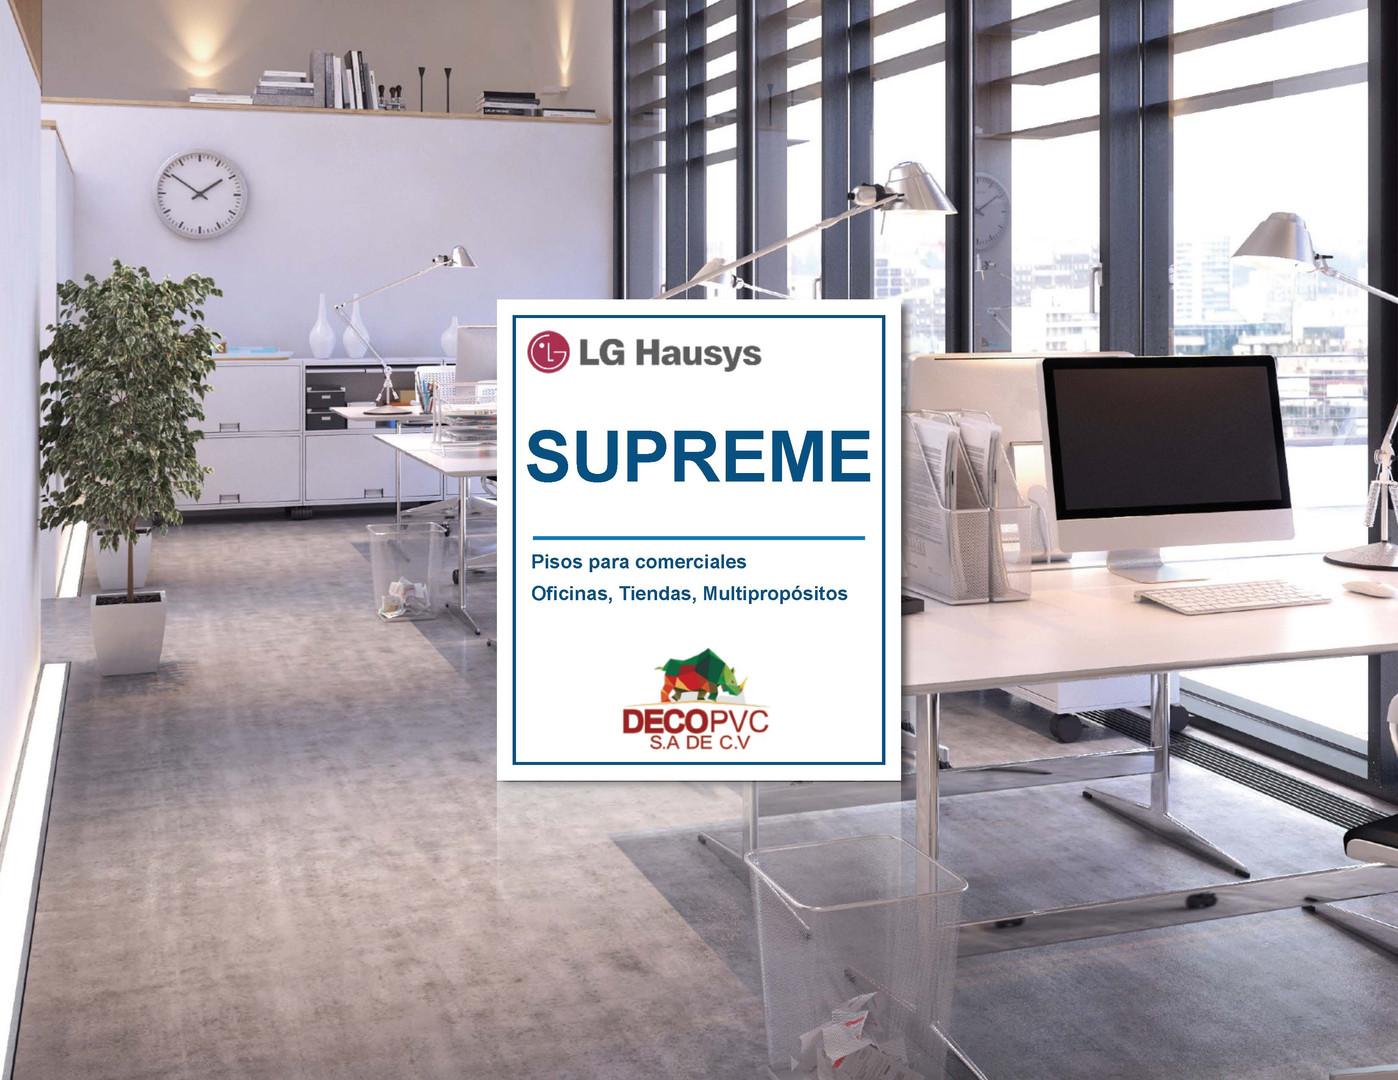 LG Hausys Supreme - Catálogo_頁面_1.jpg